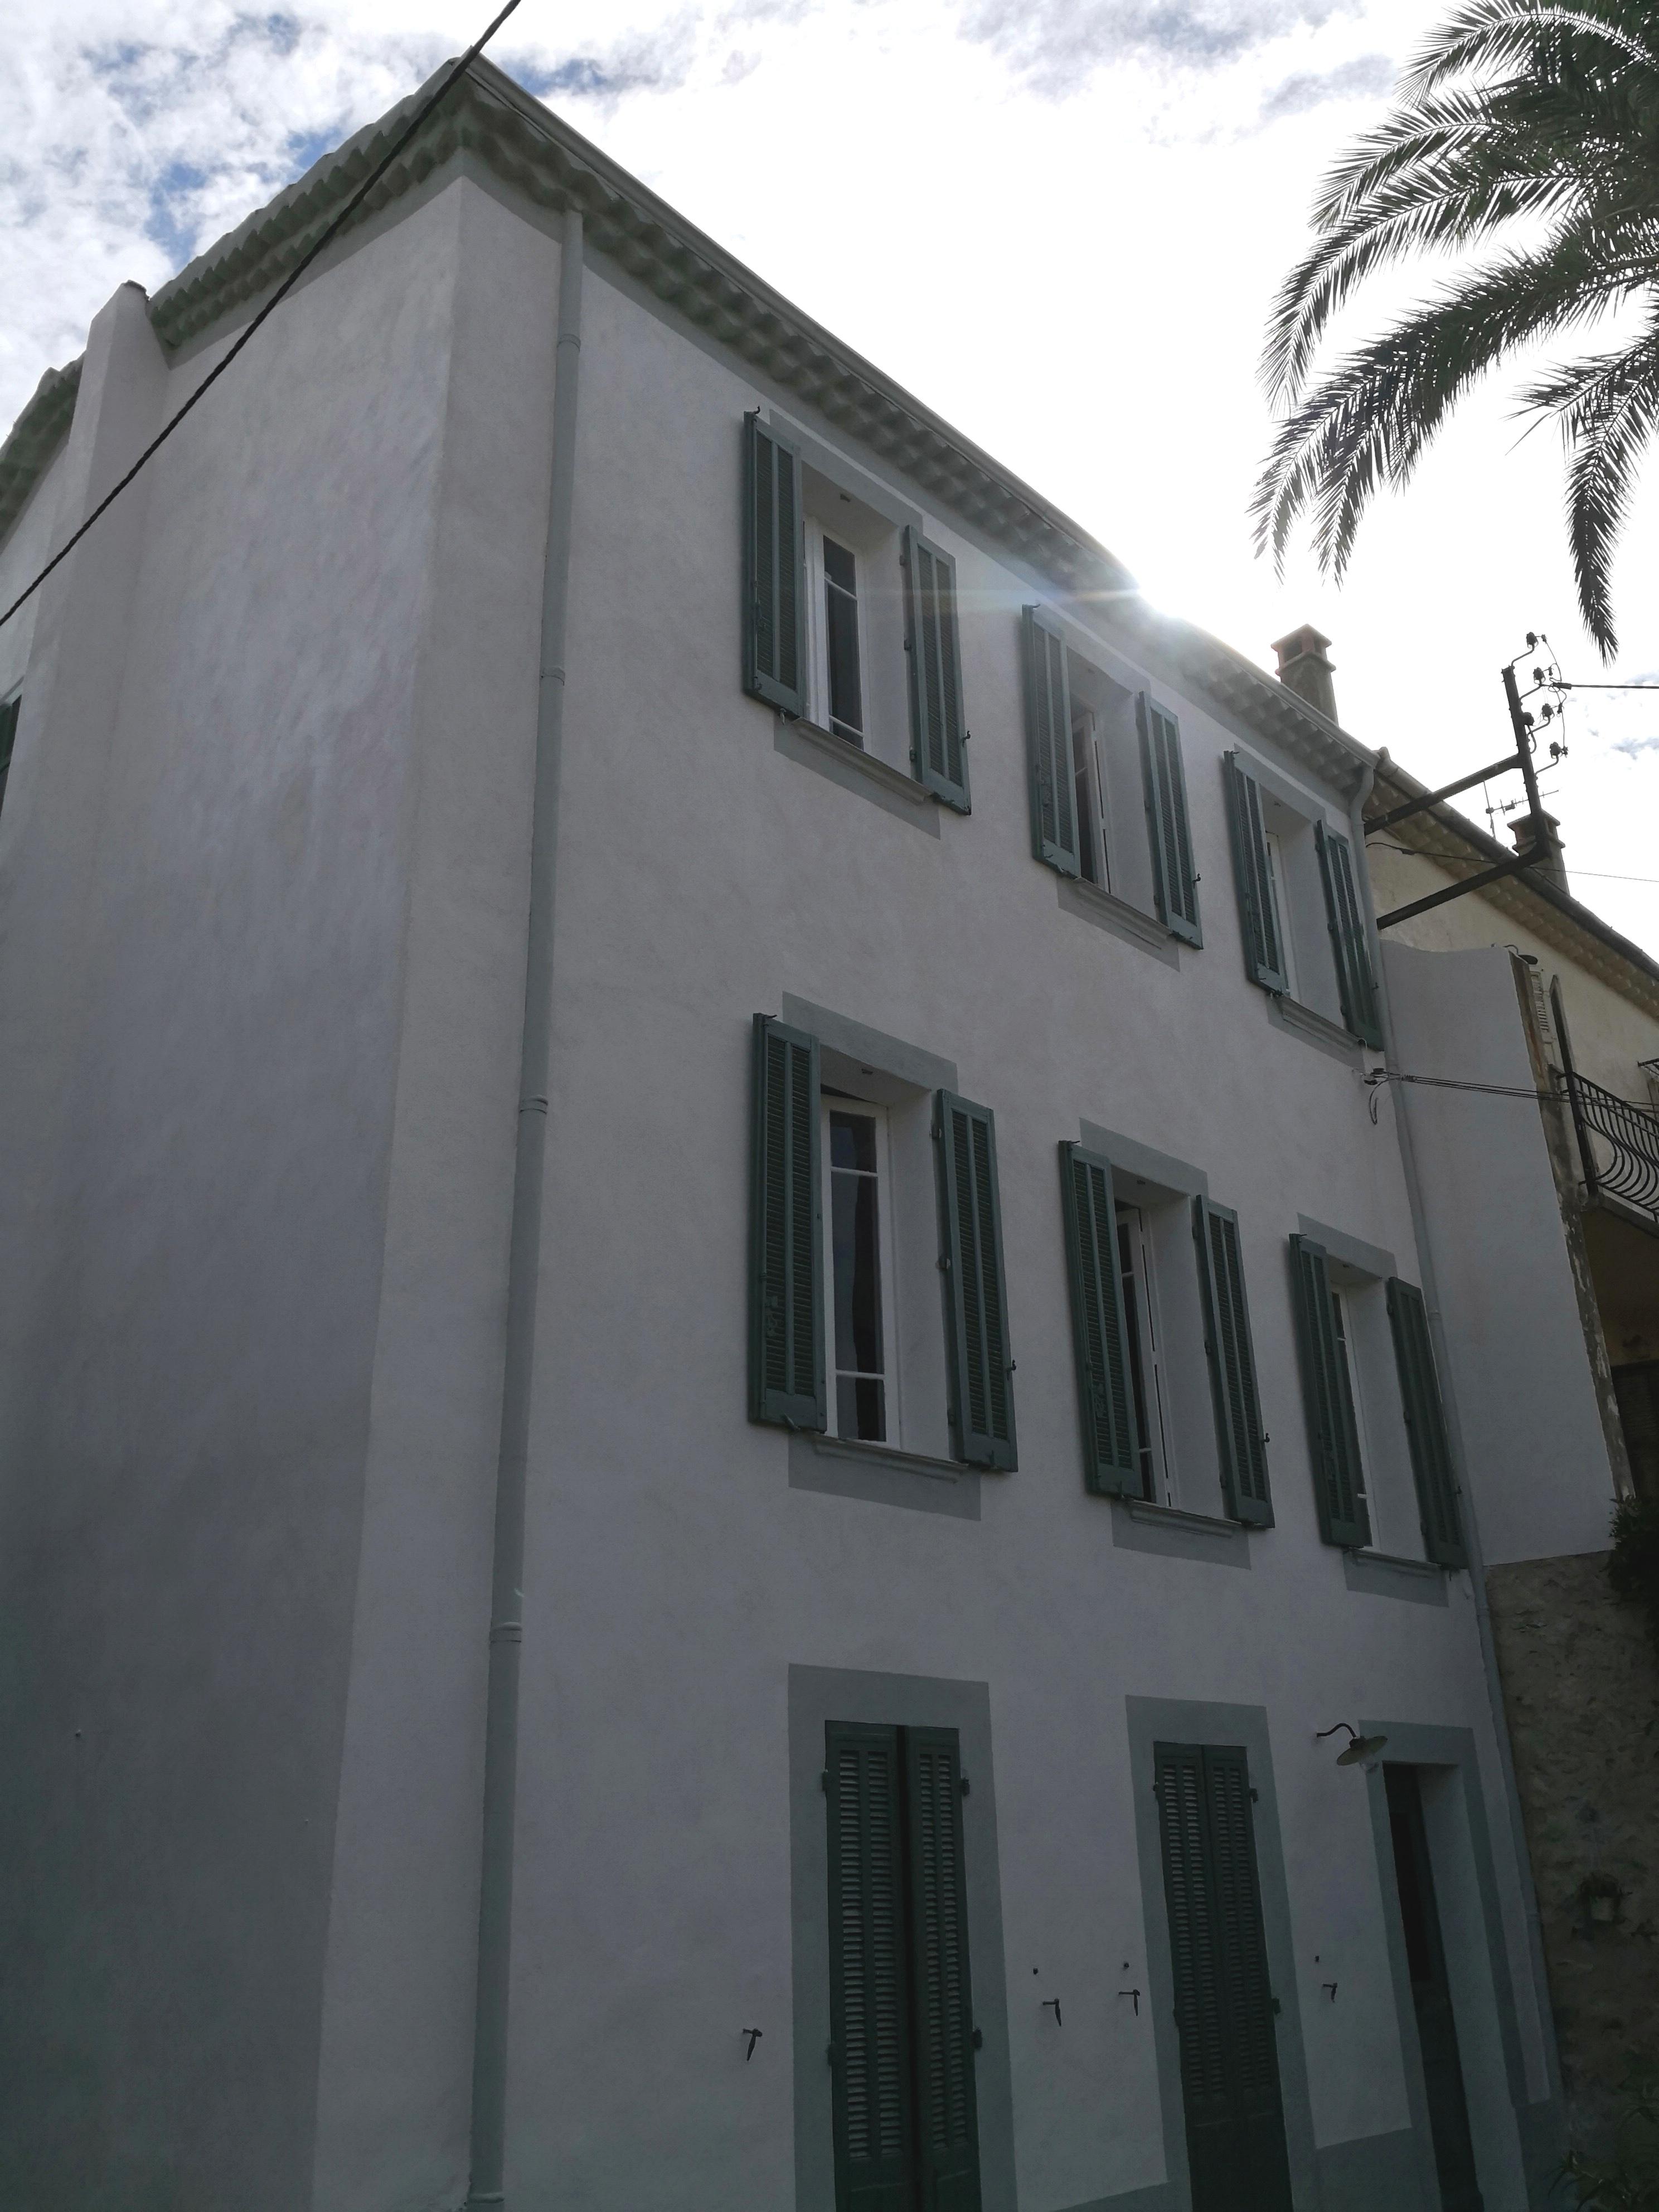 Rénovation façade demeure 1900